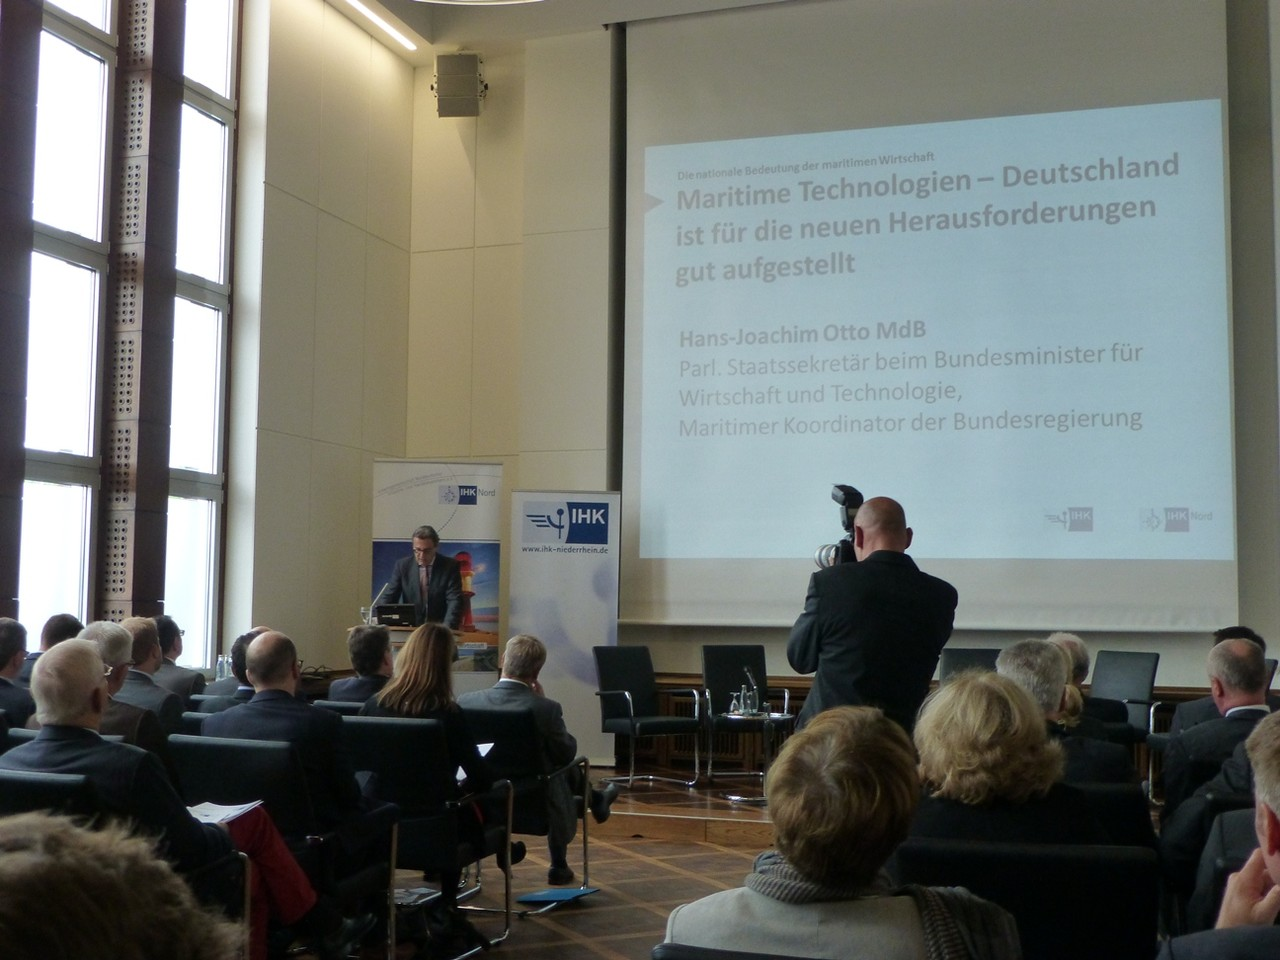 Duisburg Roadshow Maritime Wirtschaft